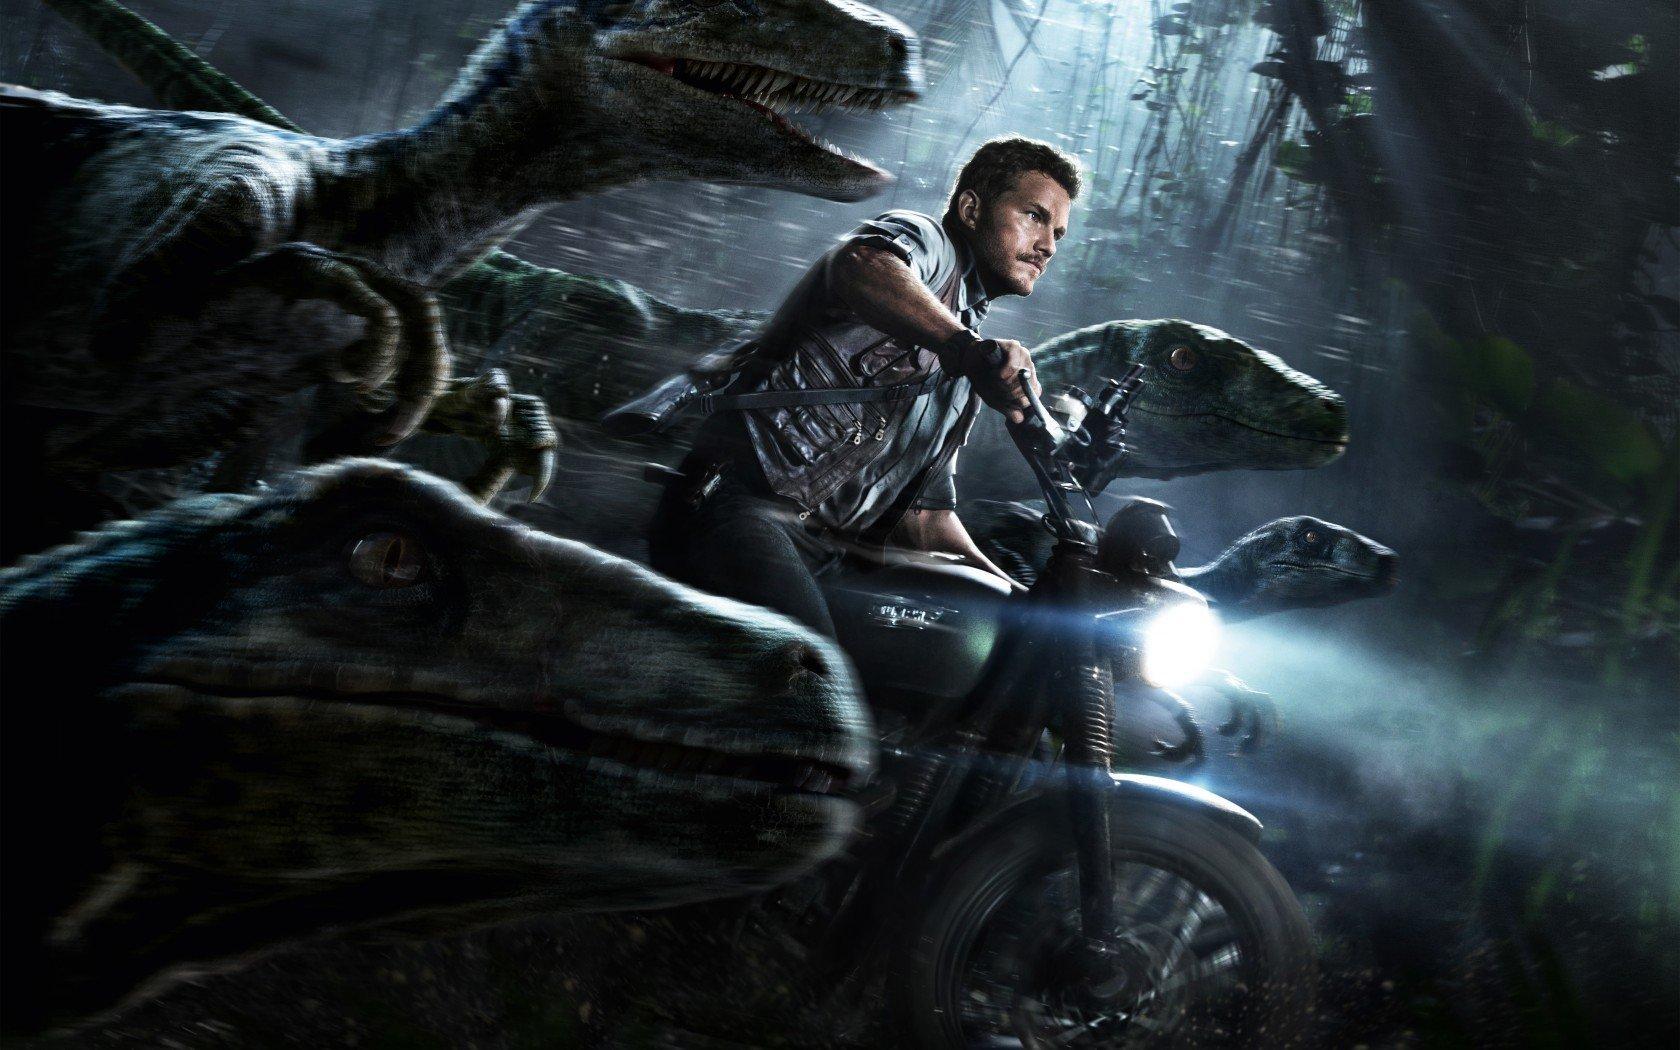 Fascinating Jurassic World fan theory claims the raptors were always on  Chris Pratt's side -Blastr